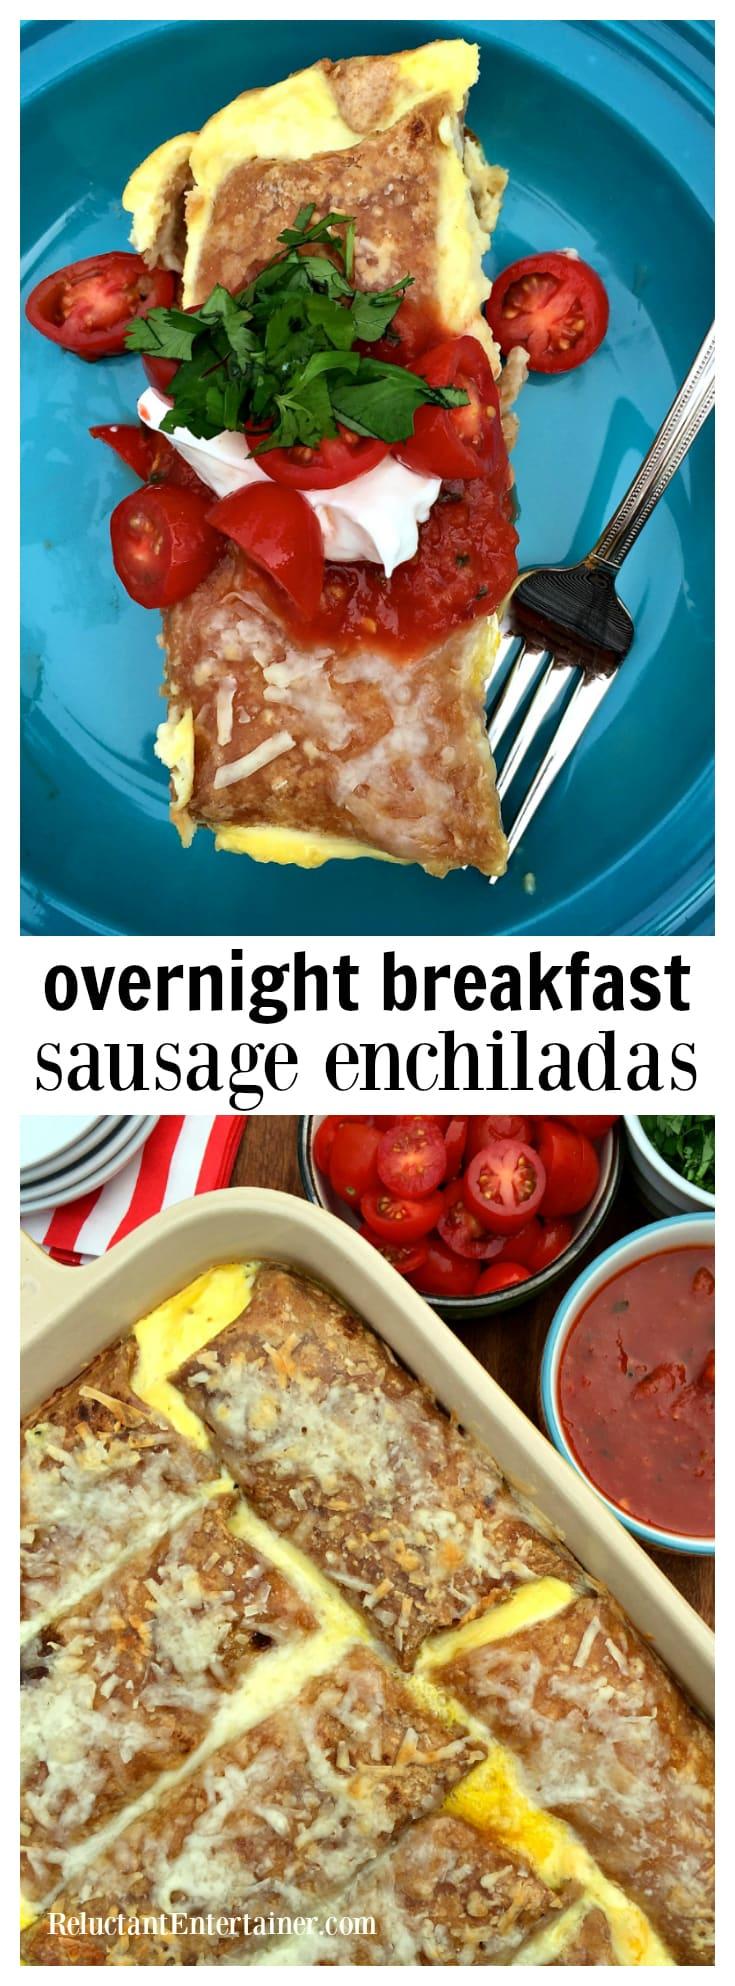 Overnight Breakfast Sausage Enchiladas